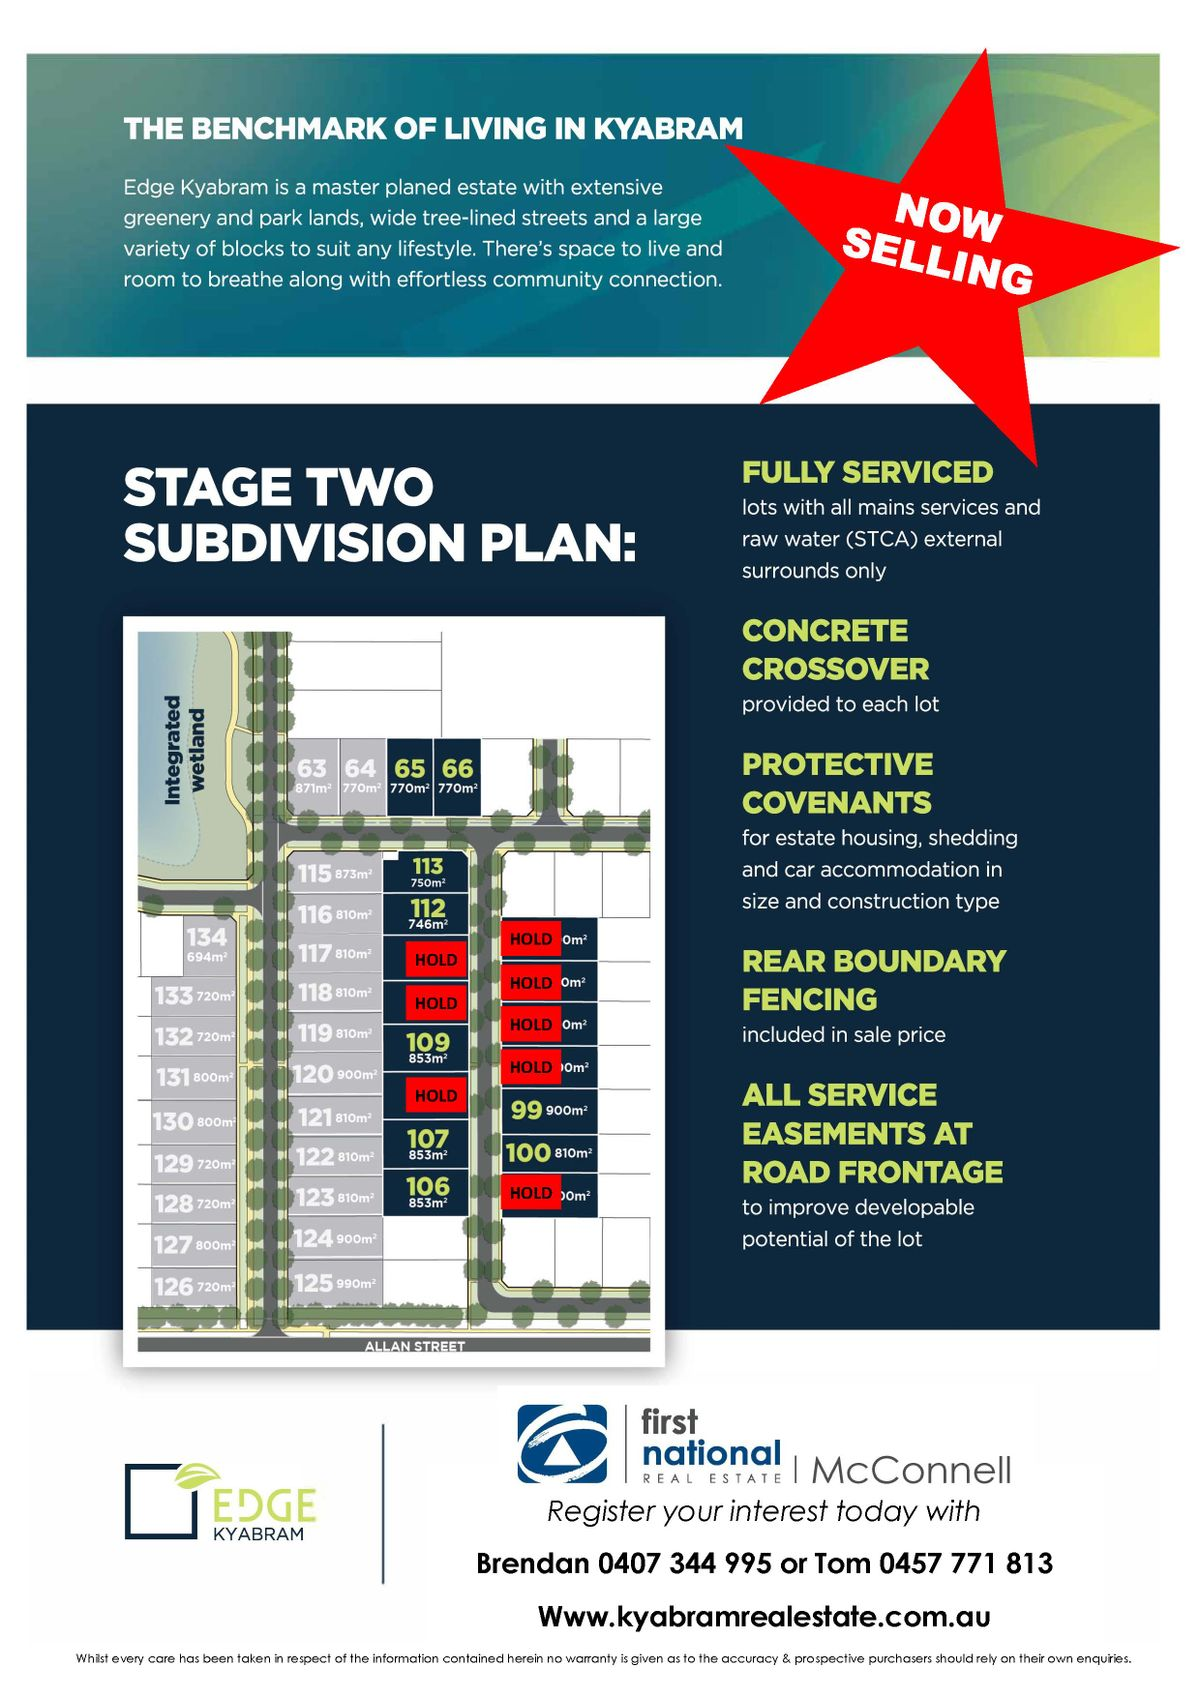 Stage 2 - 441 Allan Street, Kyabram, VIC 3620